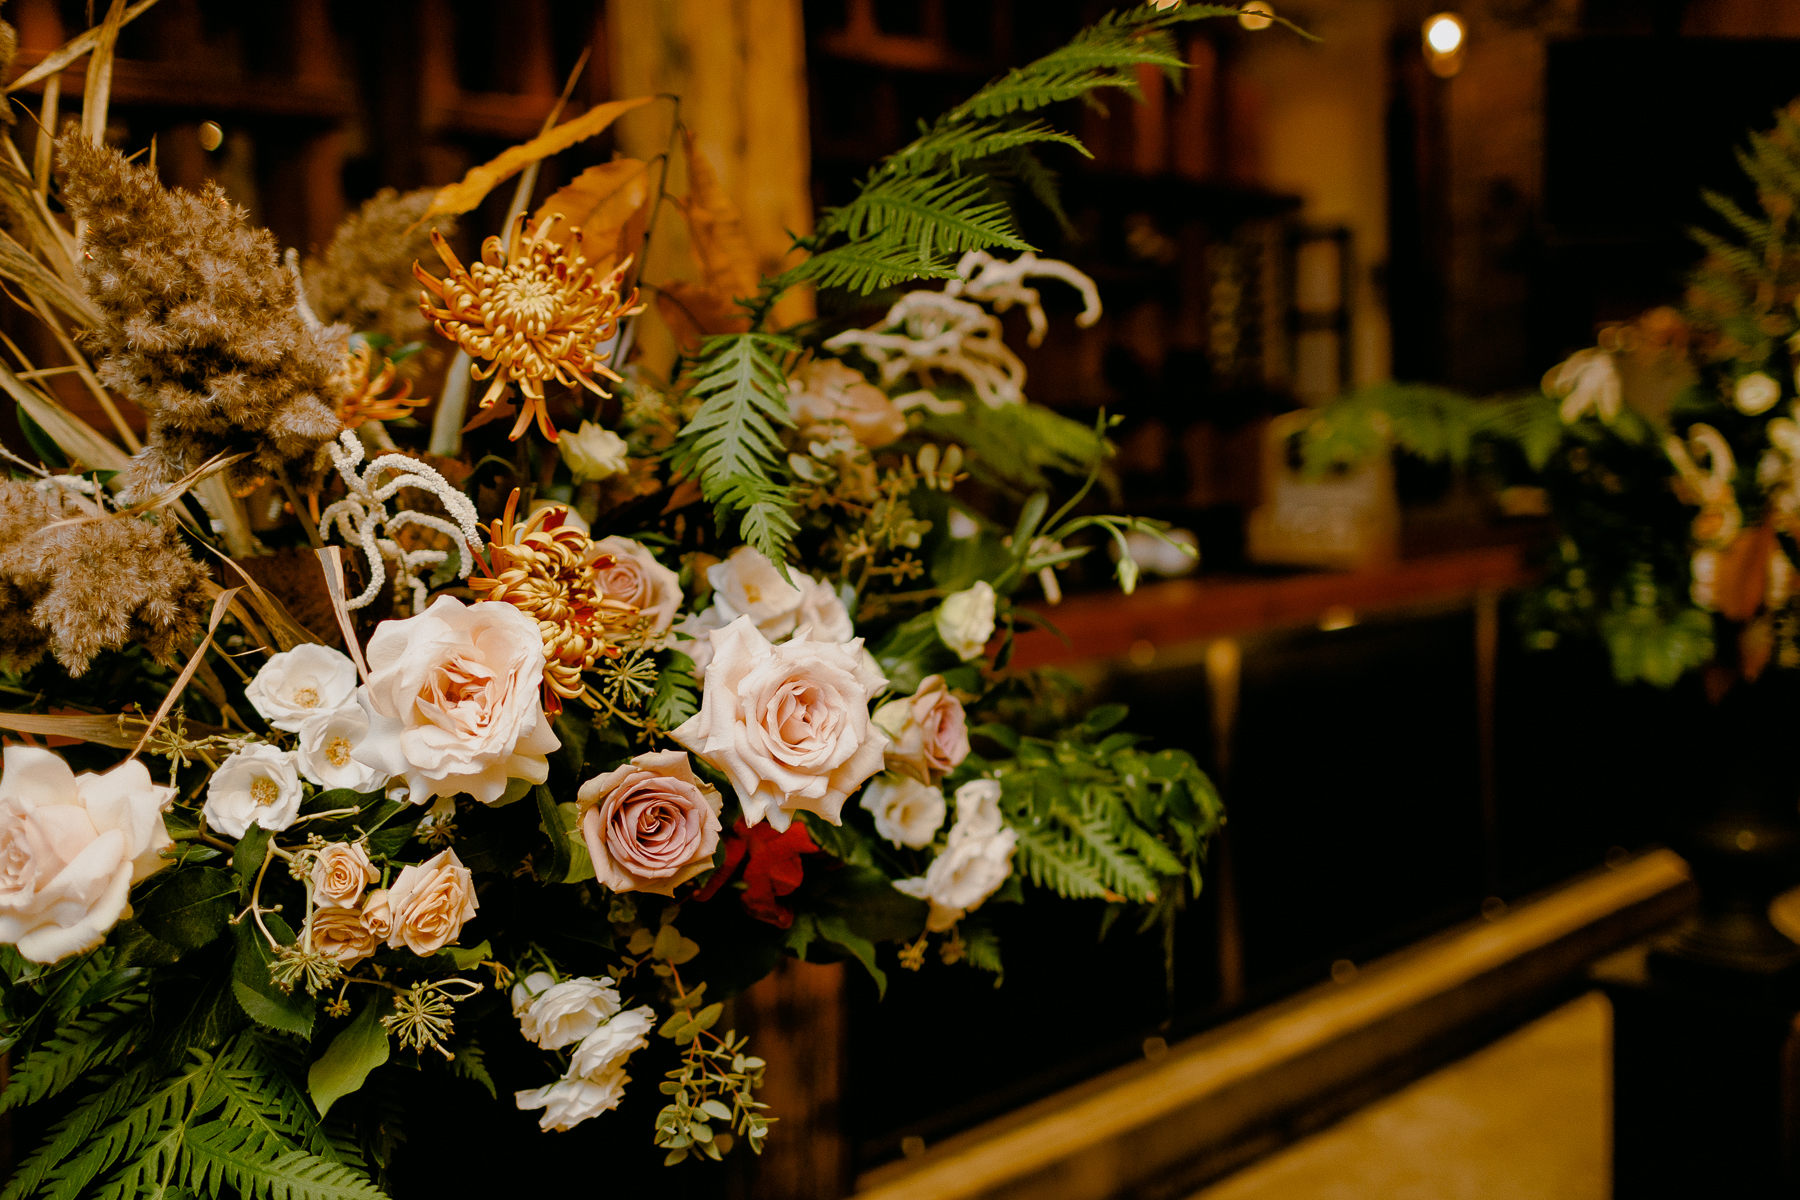 flower-decoration-for-wedding-reception 0009.jpg